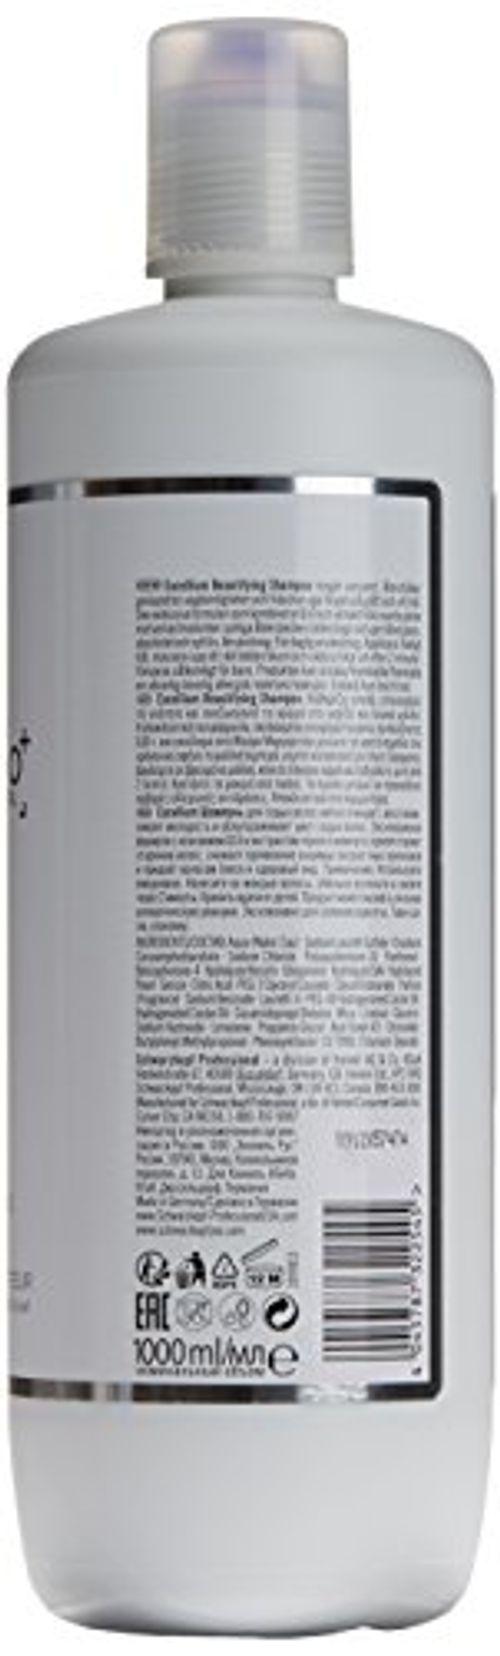 photo Wallpaper of Schwarzkopf-Schwarzkopf BC Excellium Beautifying Champú   1000 Ml-